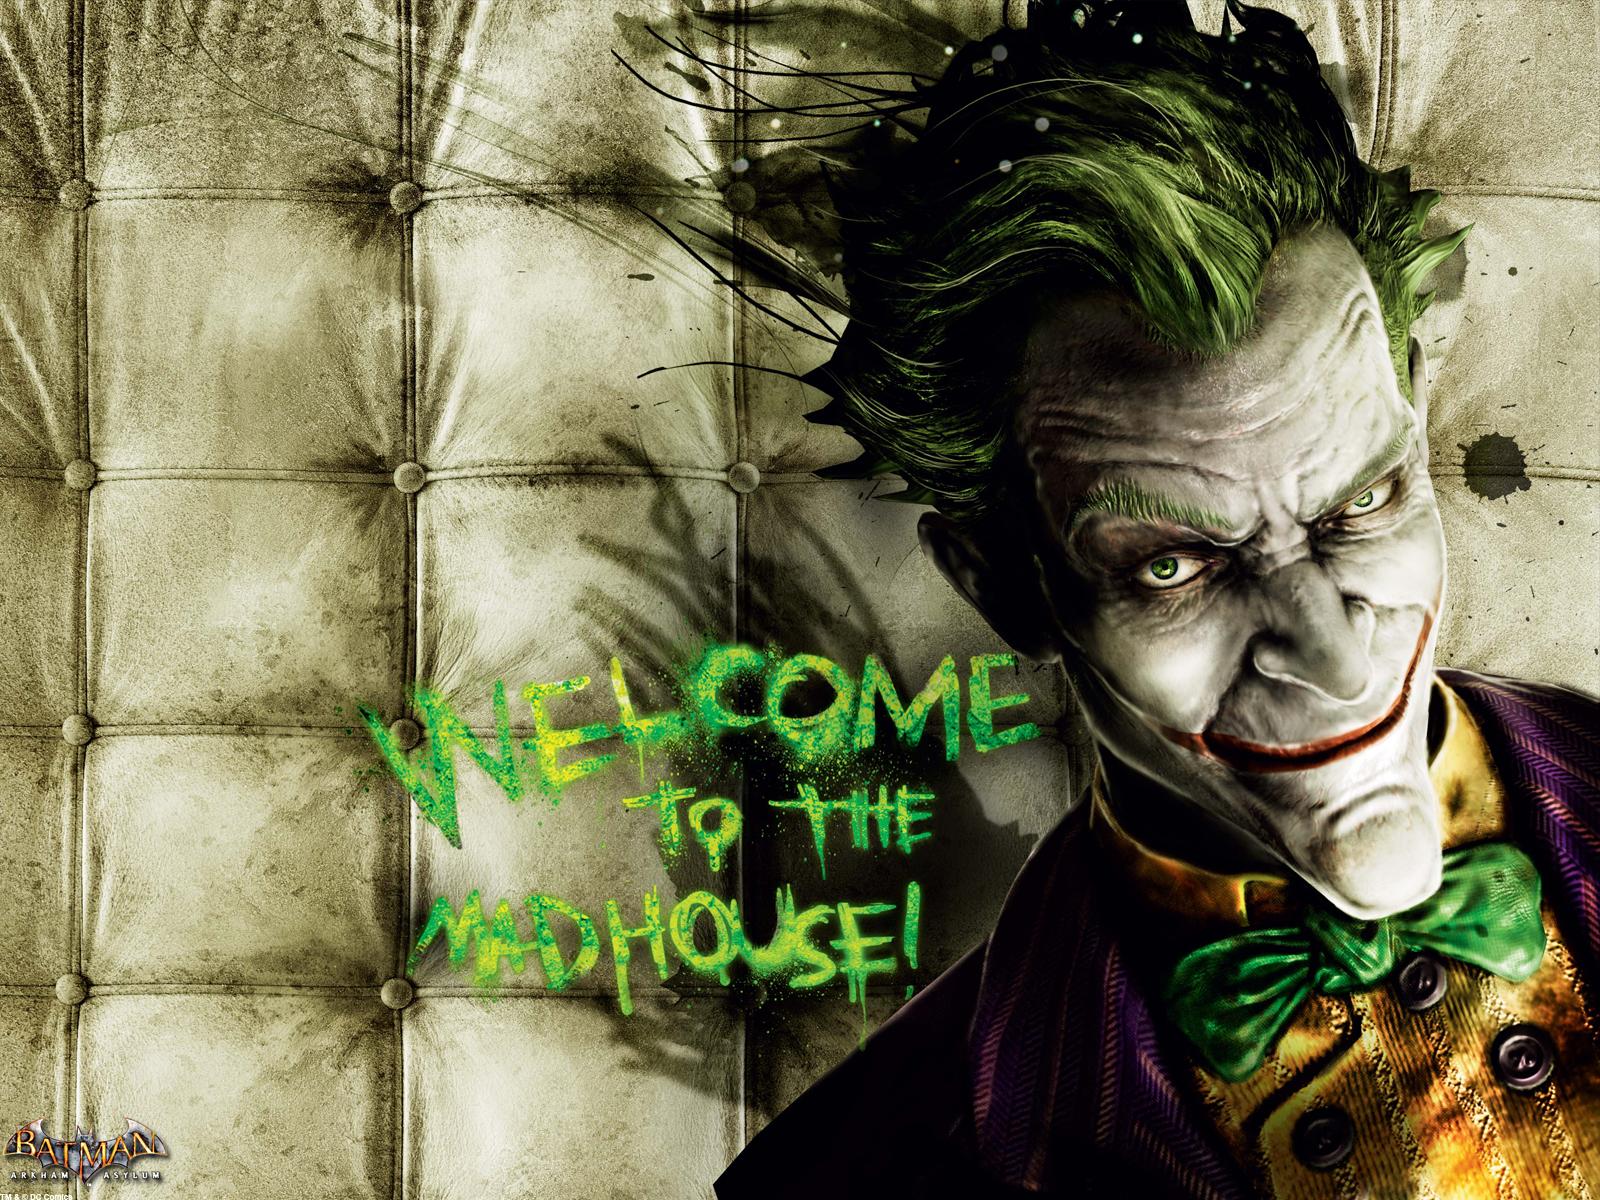 Batman Arkham Asylum Joker Wallpaper